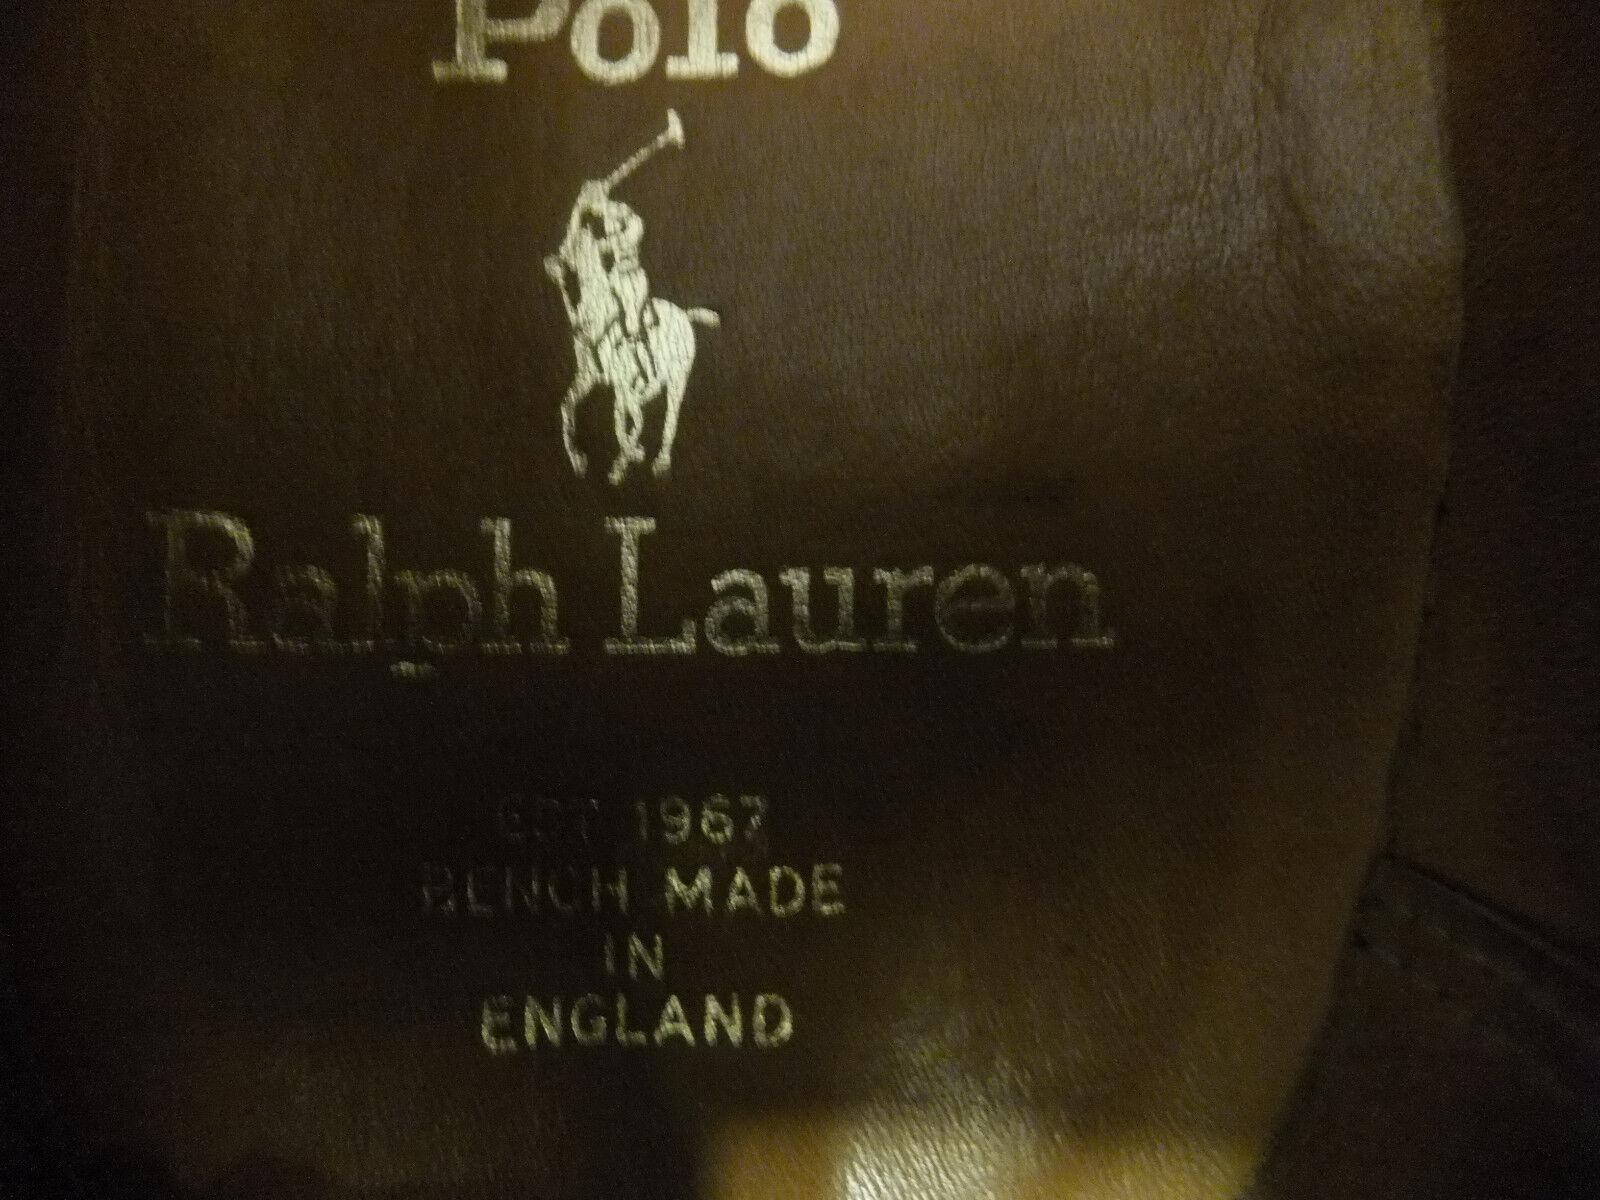 Rarität Rarität Rarität POLO Polo Ralph Lauren Herren Halbschuhe Gr. 9,5 weiß/blau & rote Sohle! 1f7566